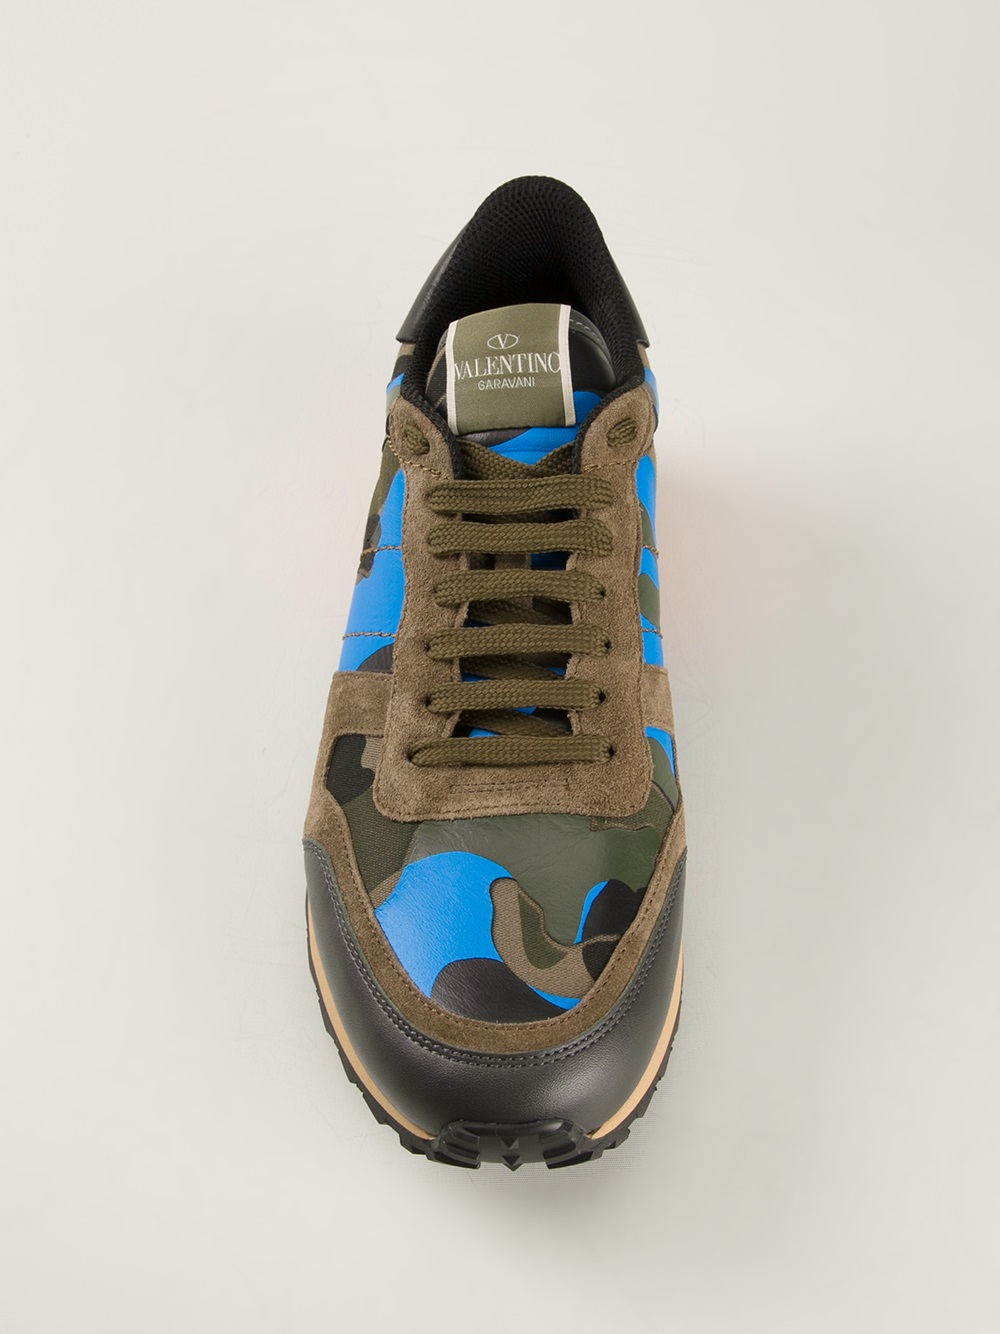 8d40098e7166 For Rockstud Men Lyst Valentino Sneakers In Green gxXwWBqUA